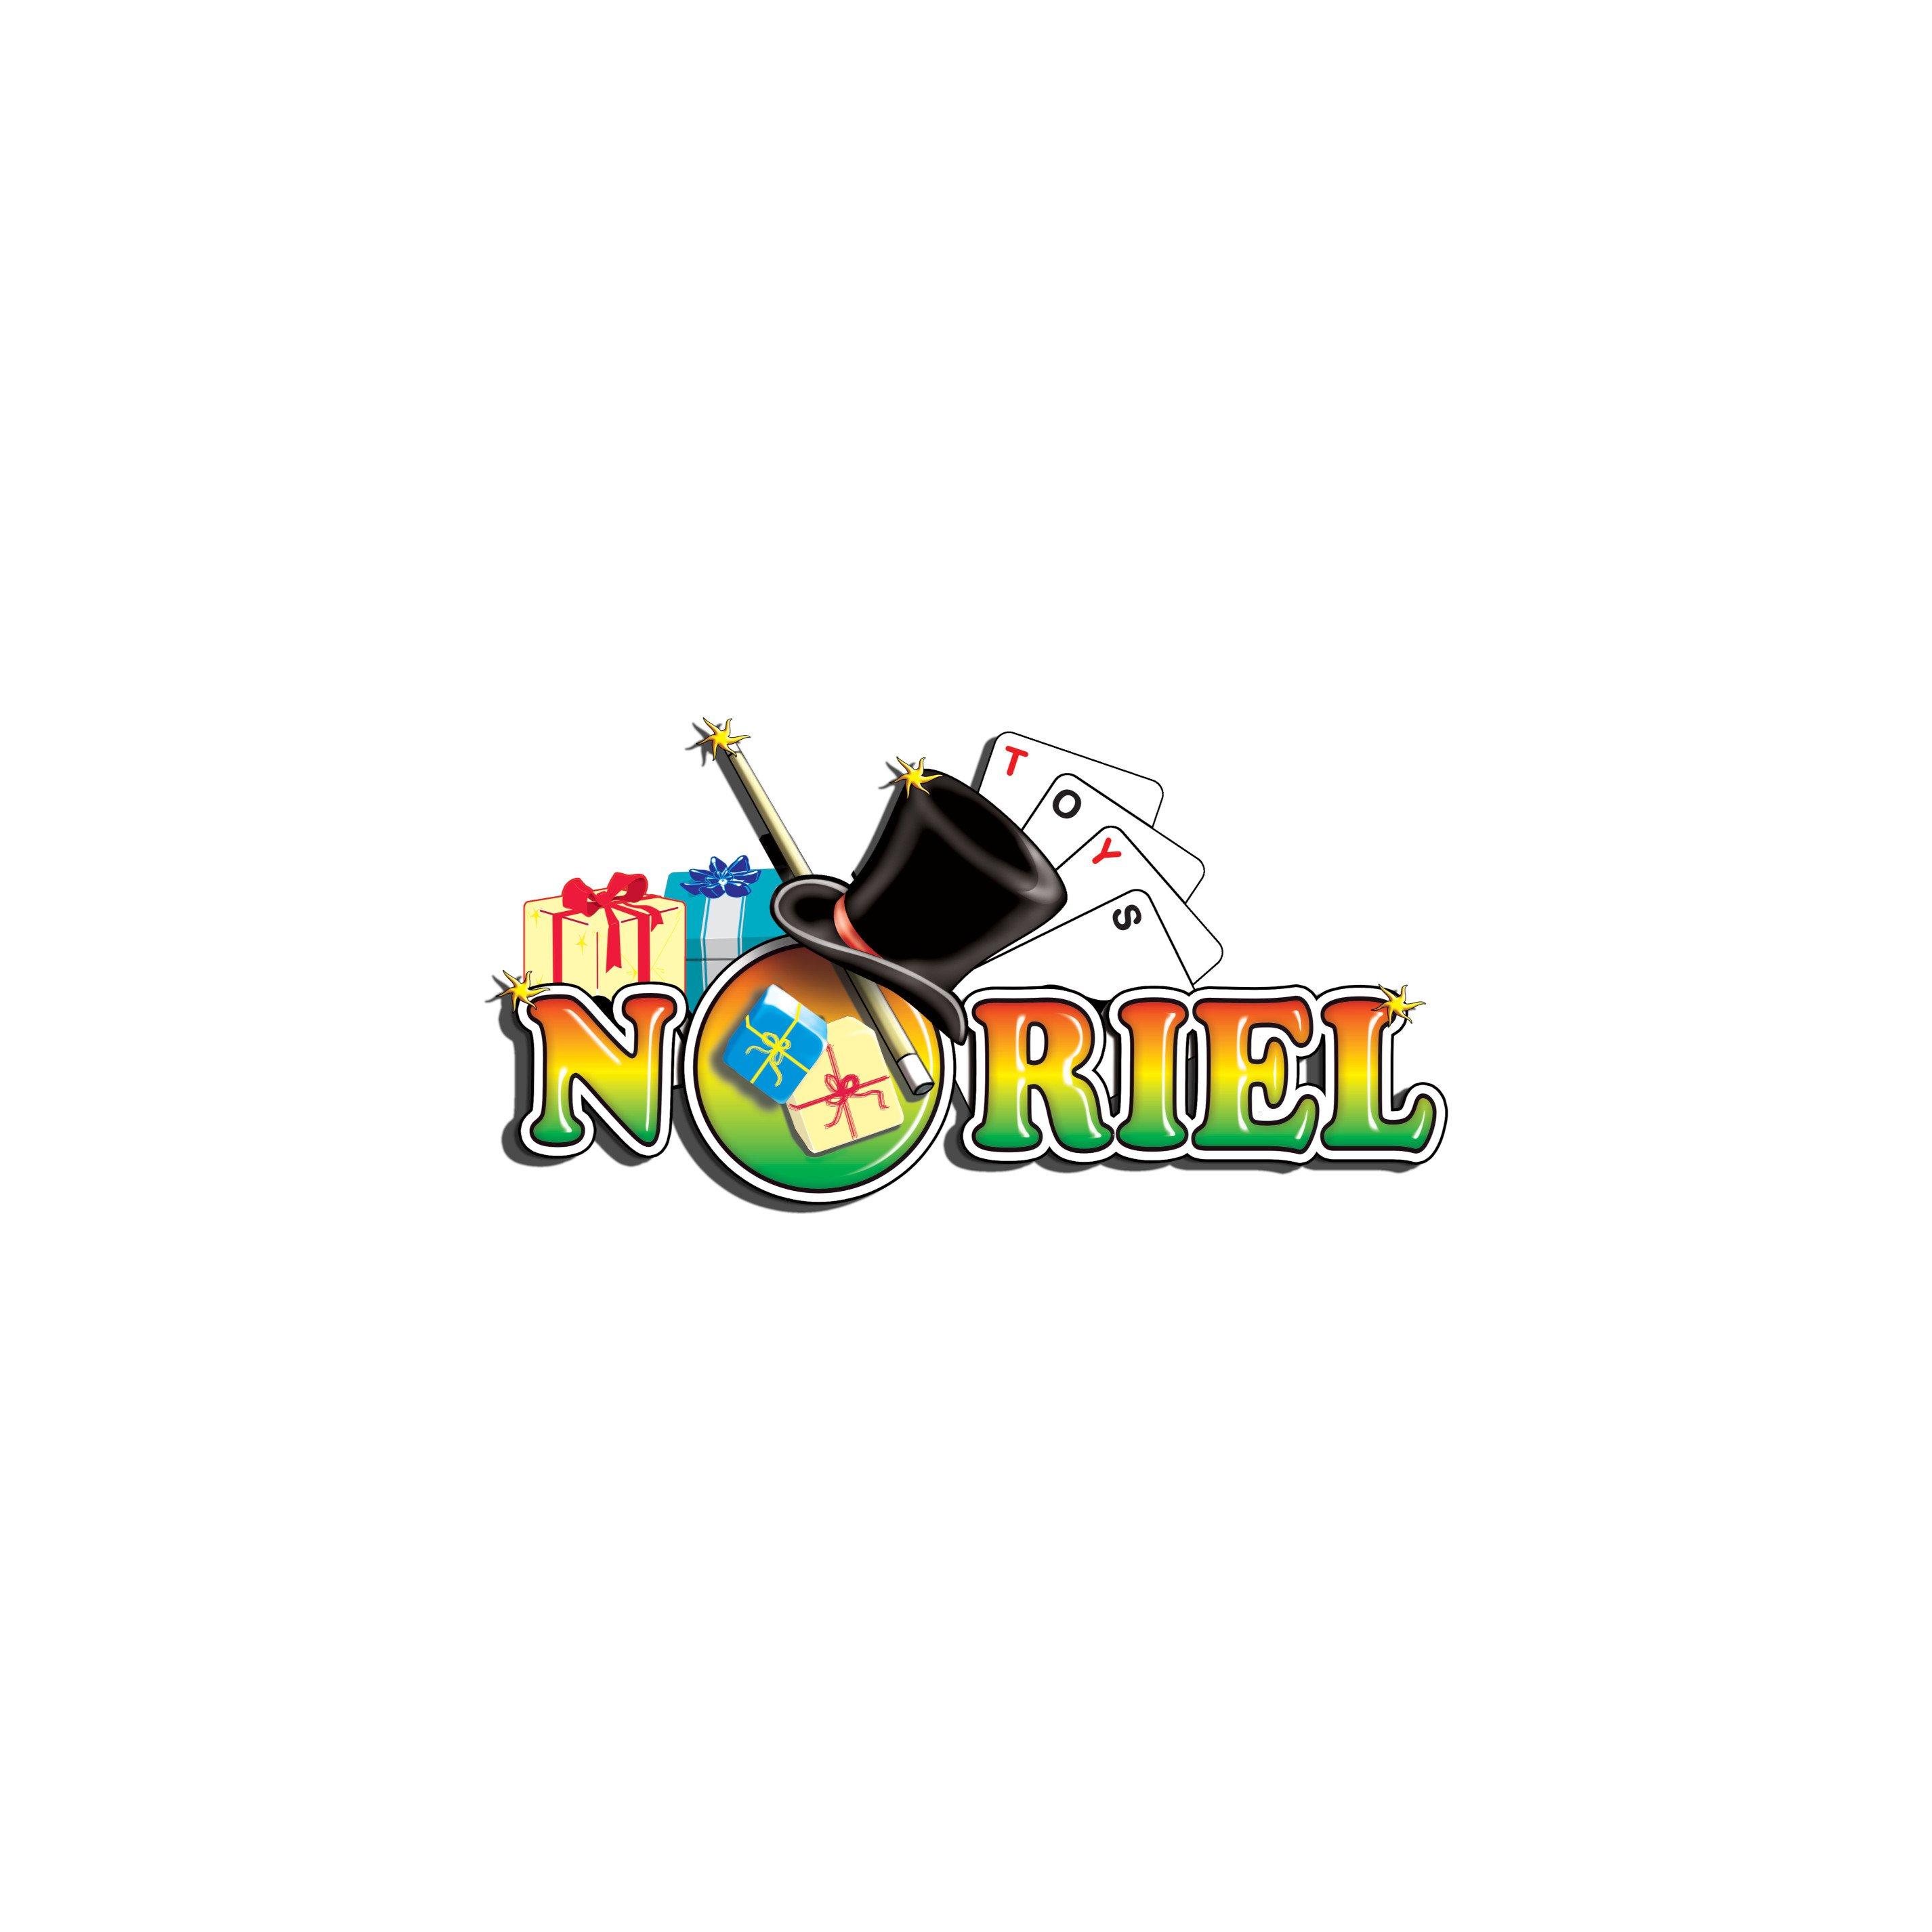 100231L_001w Minge gonflabila cu paleta Disney Minnie